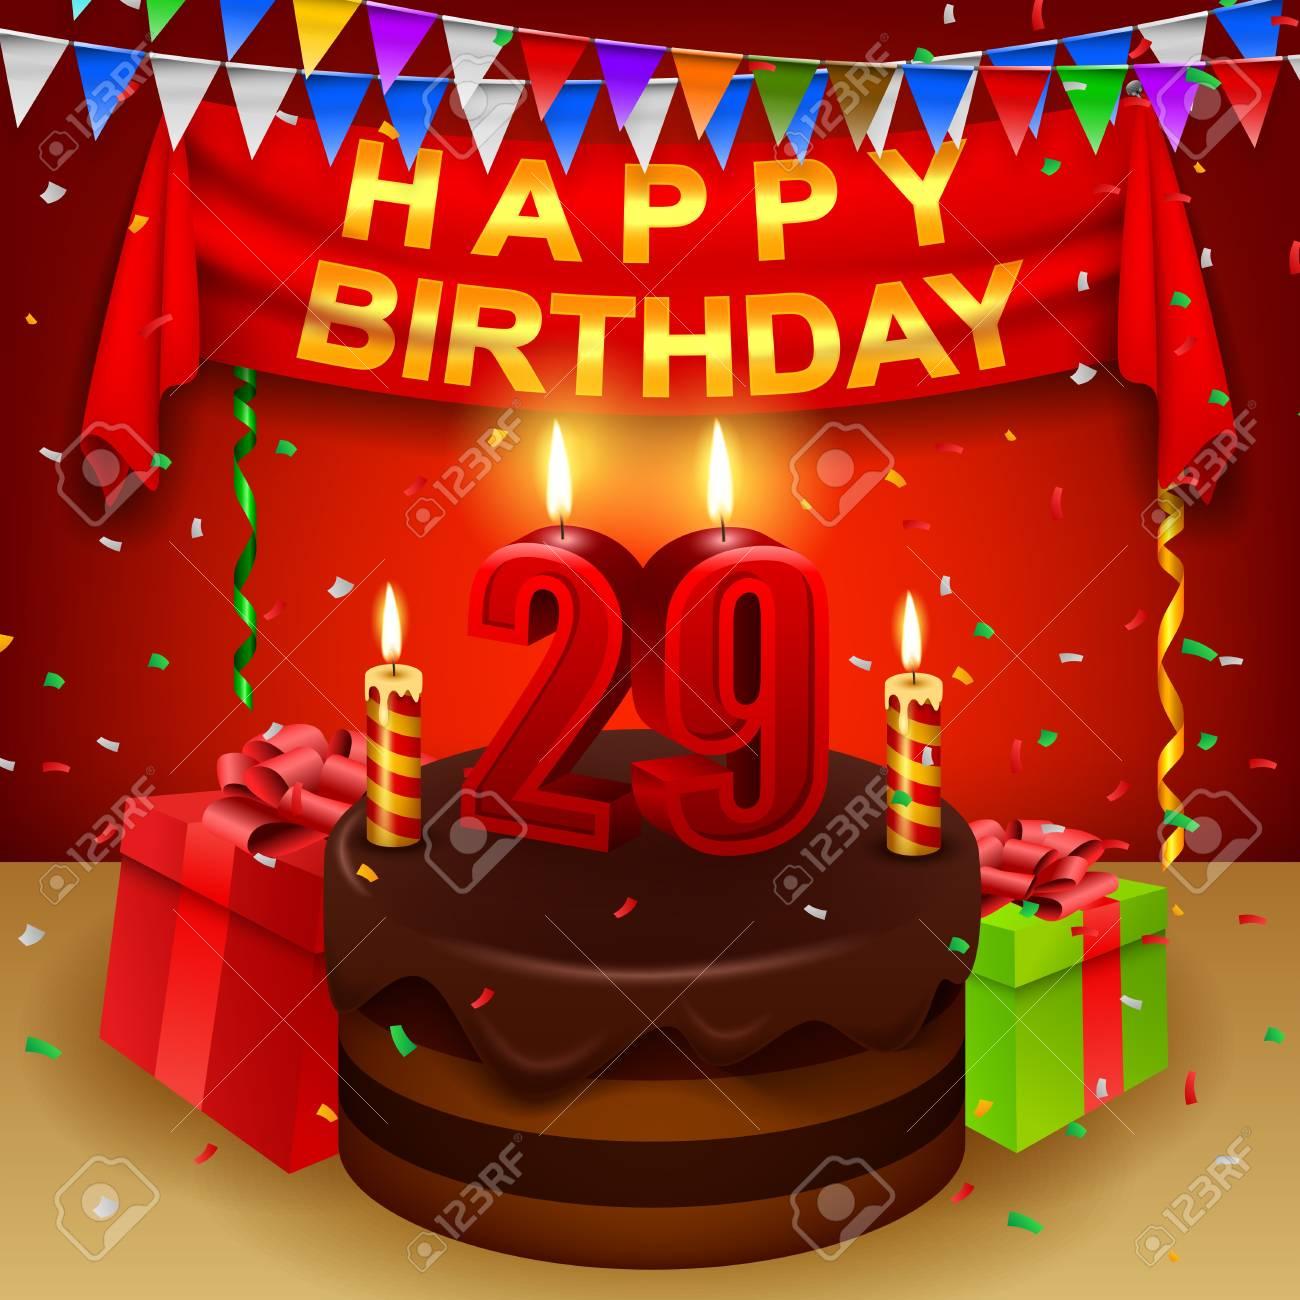 Happy 29th Birthday With Chocolate Cream Cake And Triangular Stock